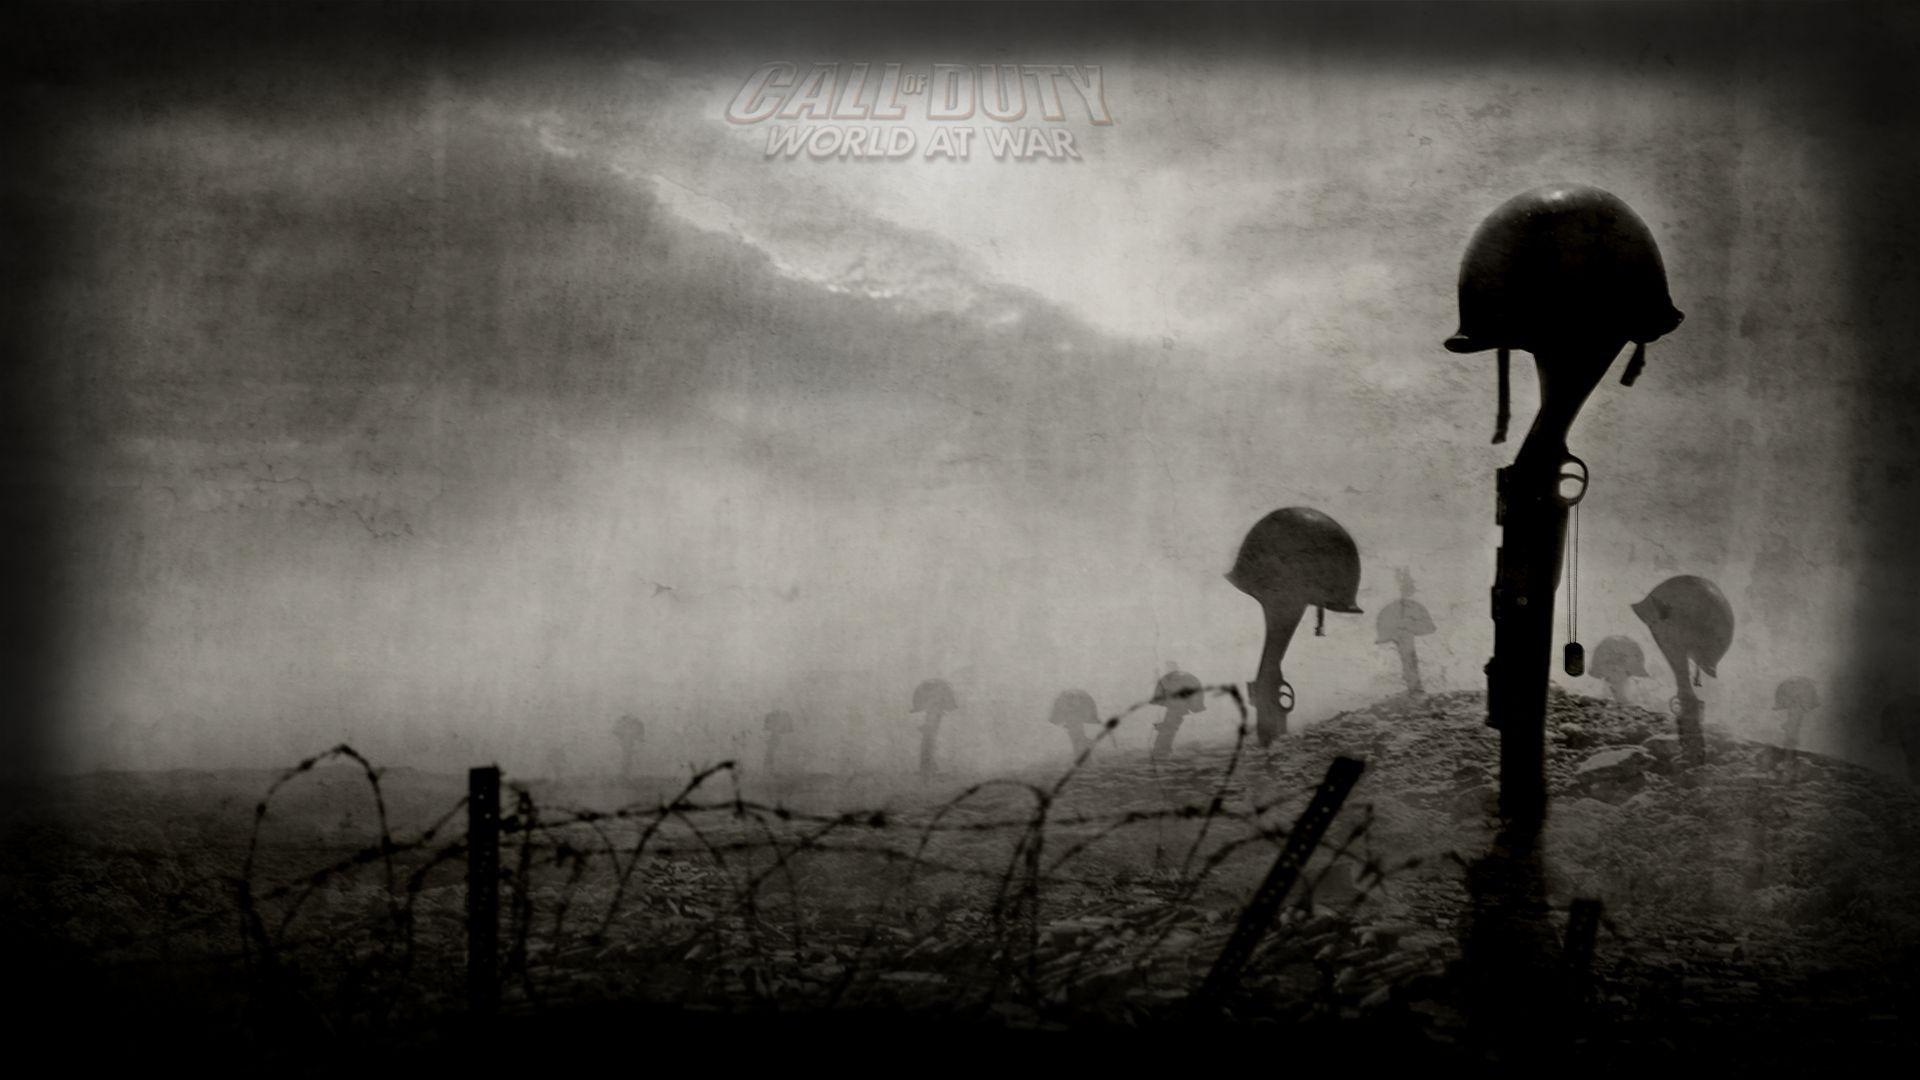 Call Of Duty World At War Wallpaper